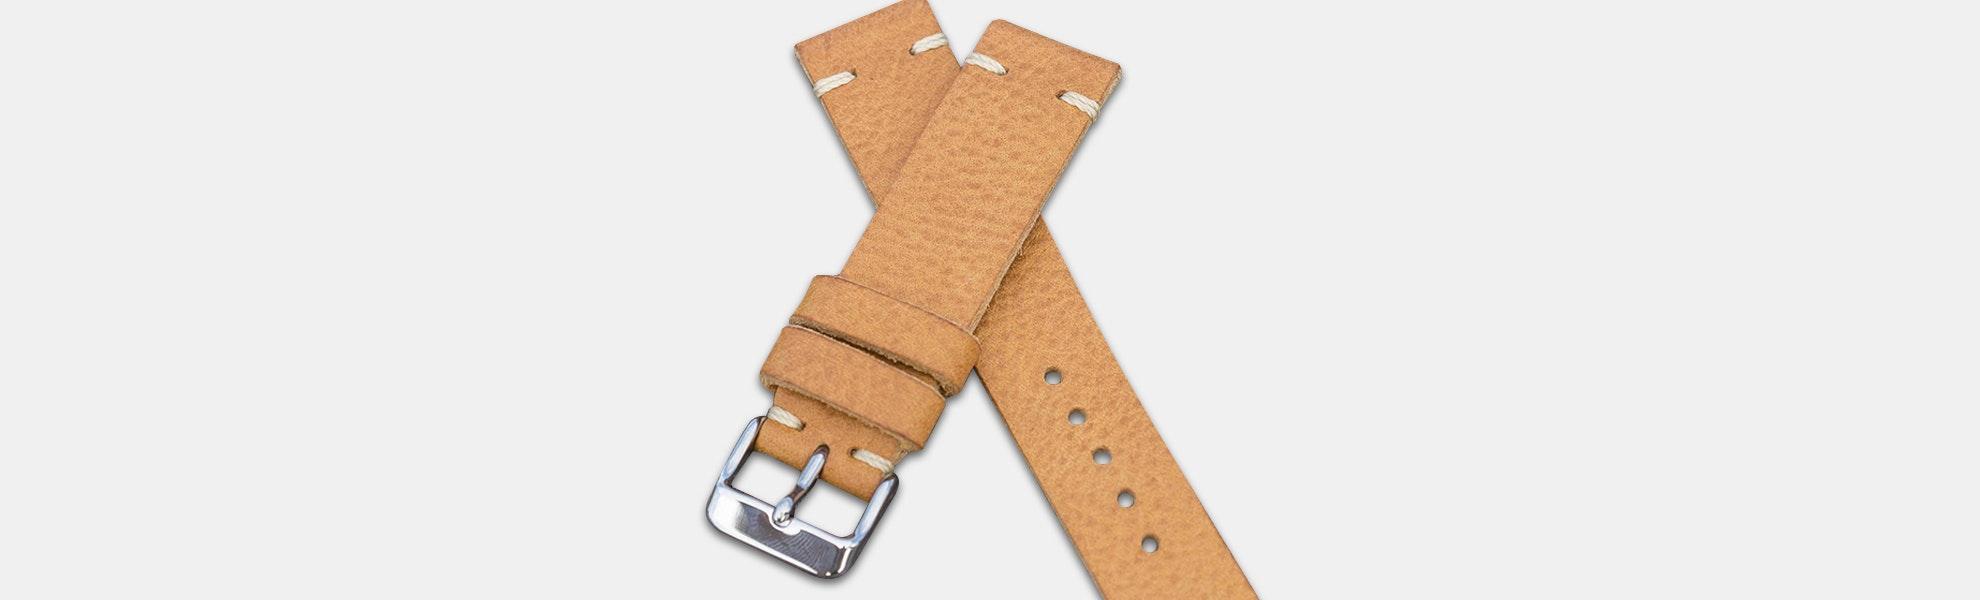 Vulture Premium Badalassi Carlo Leather Watch Strap